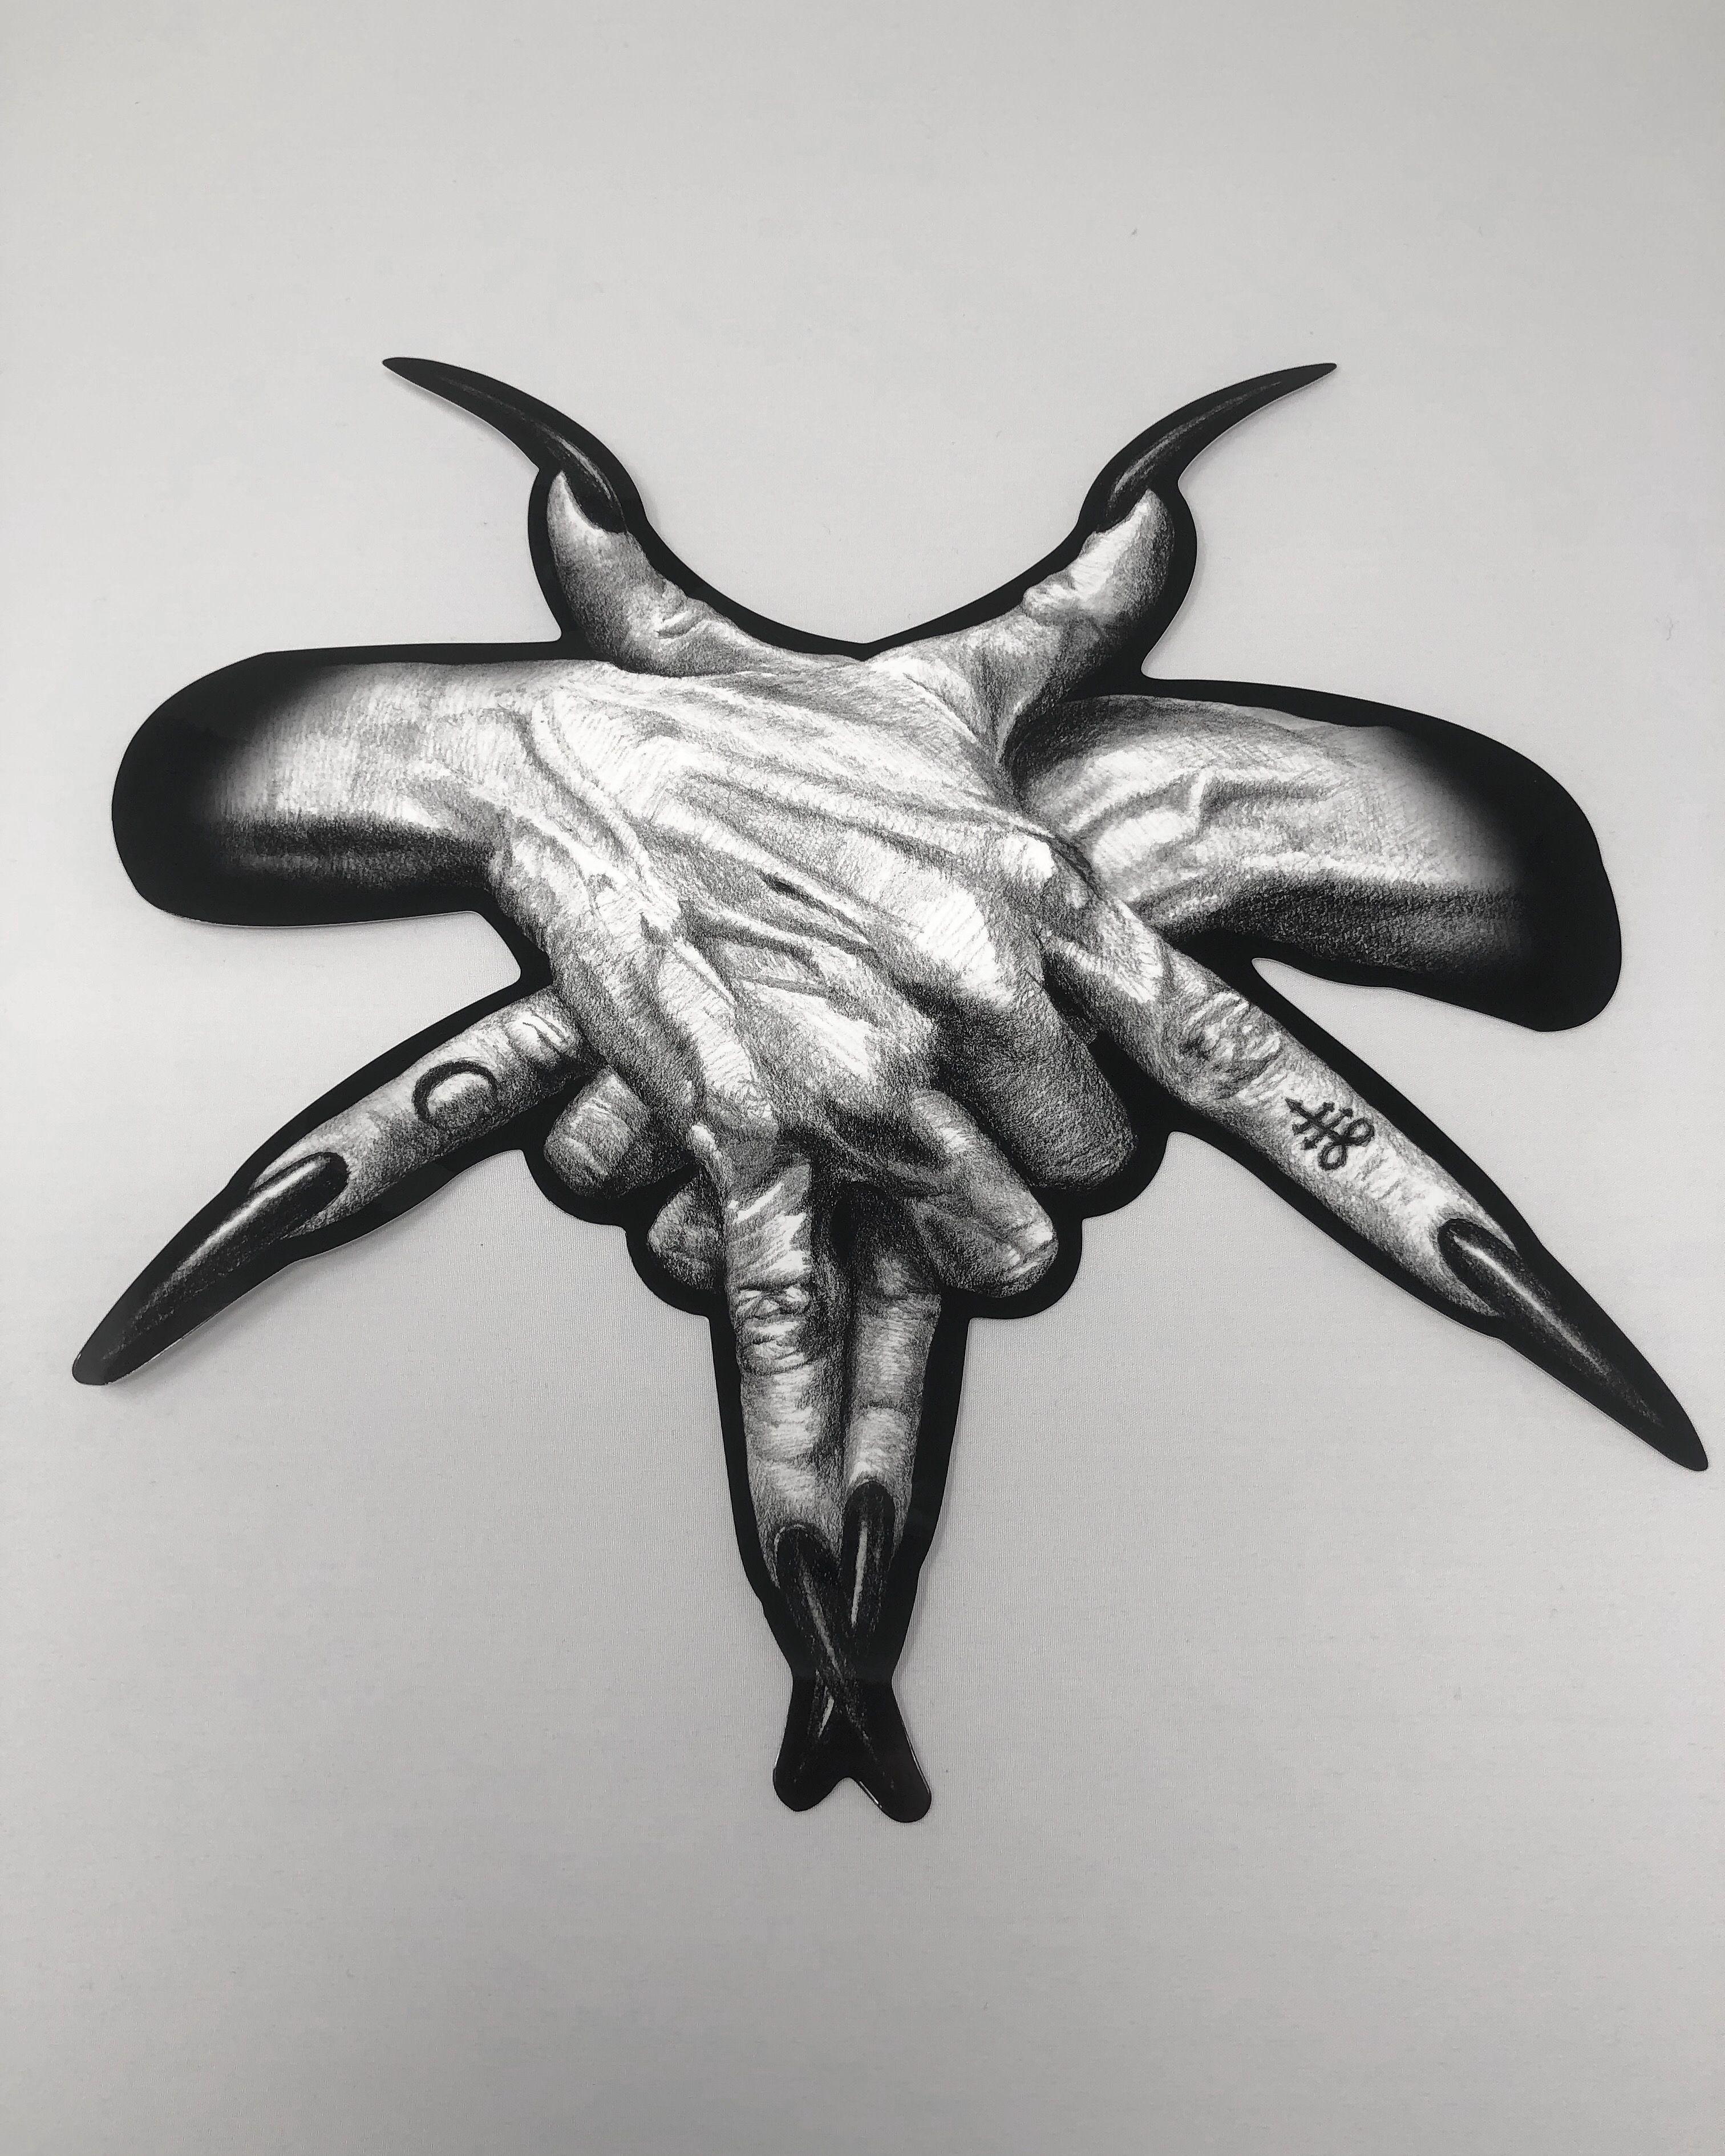 Pentagram Hands Sticker 9x9